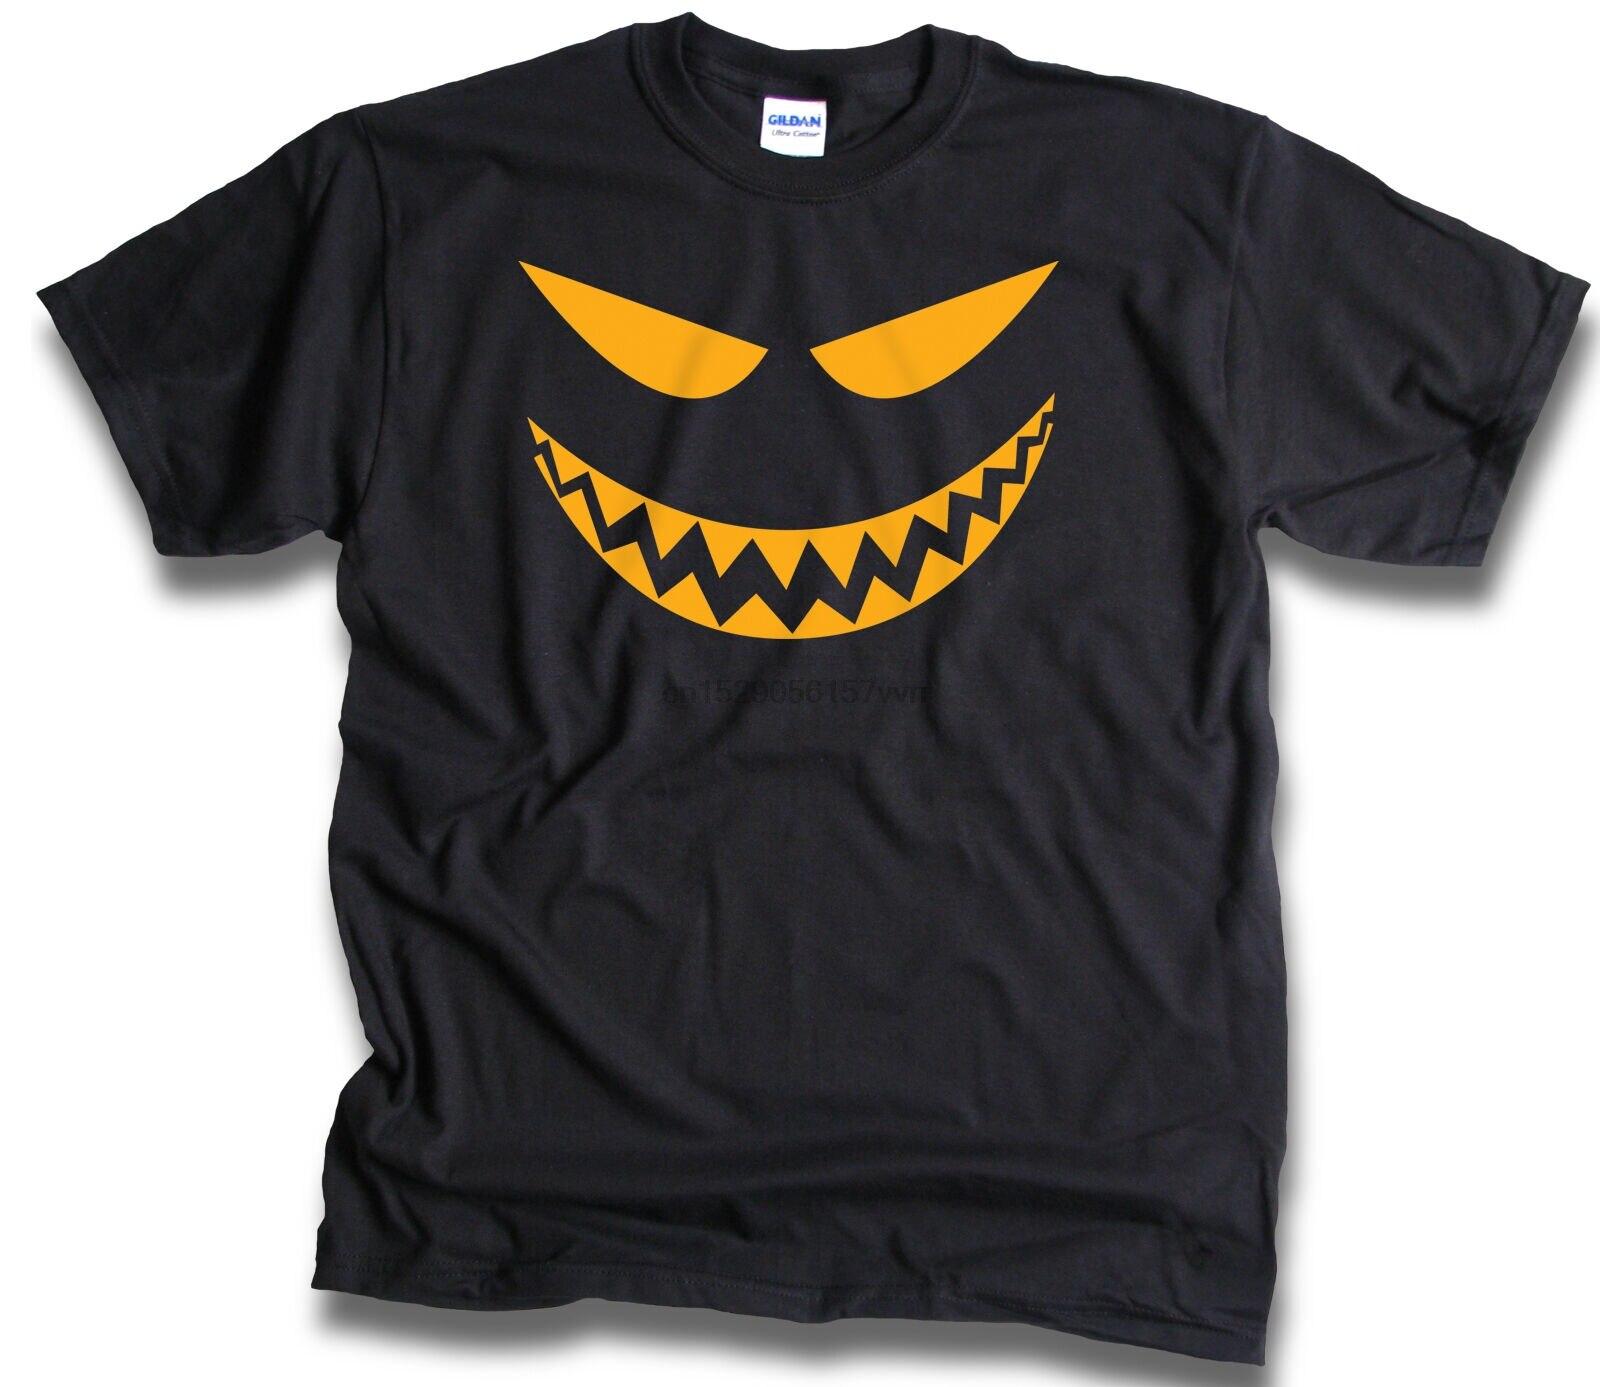 Mens Womens Funny Evil Cool Gremlin Face Black T Shirt Sm 3XL